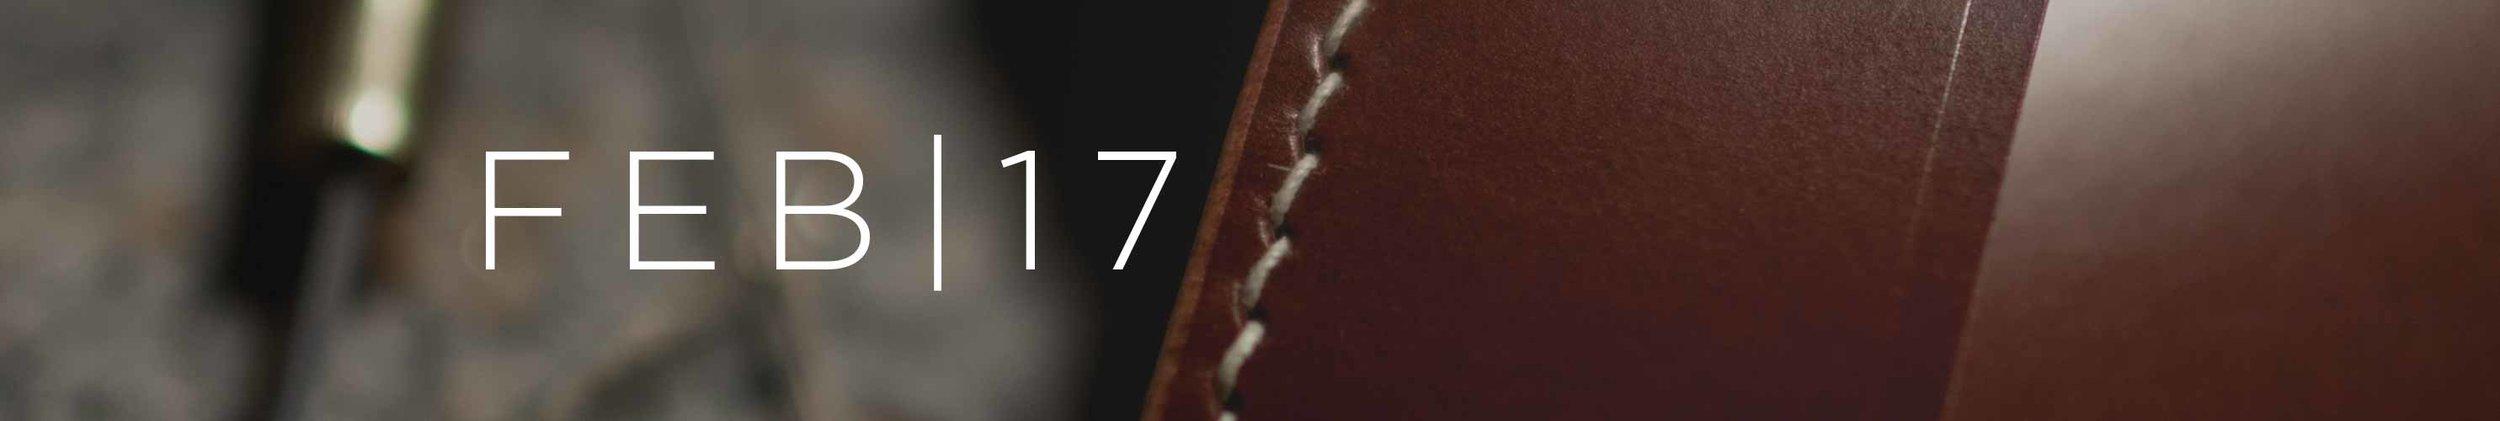 Lockeland Leatherworks February Journal Header